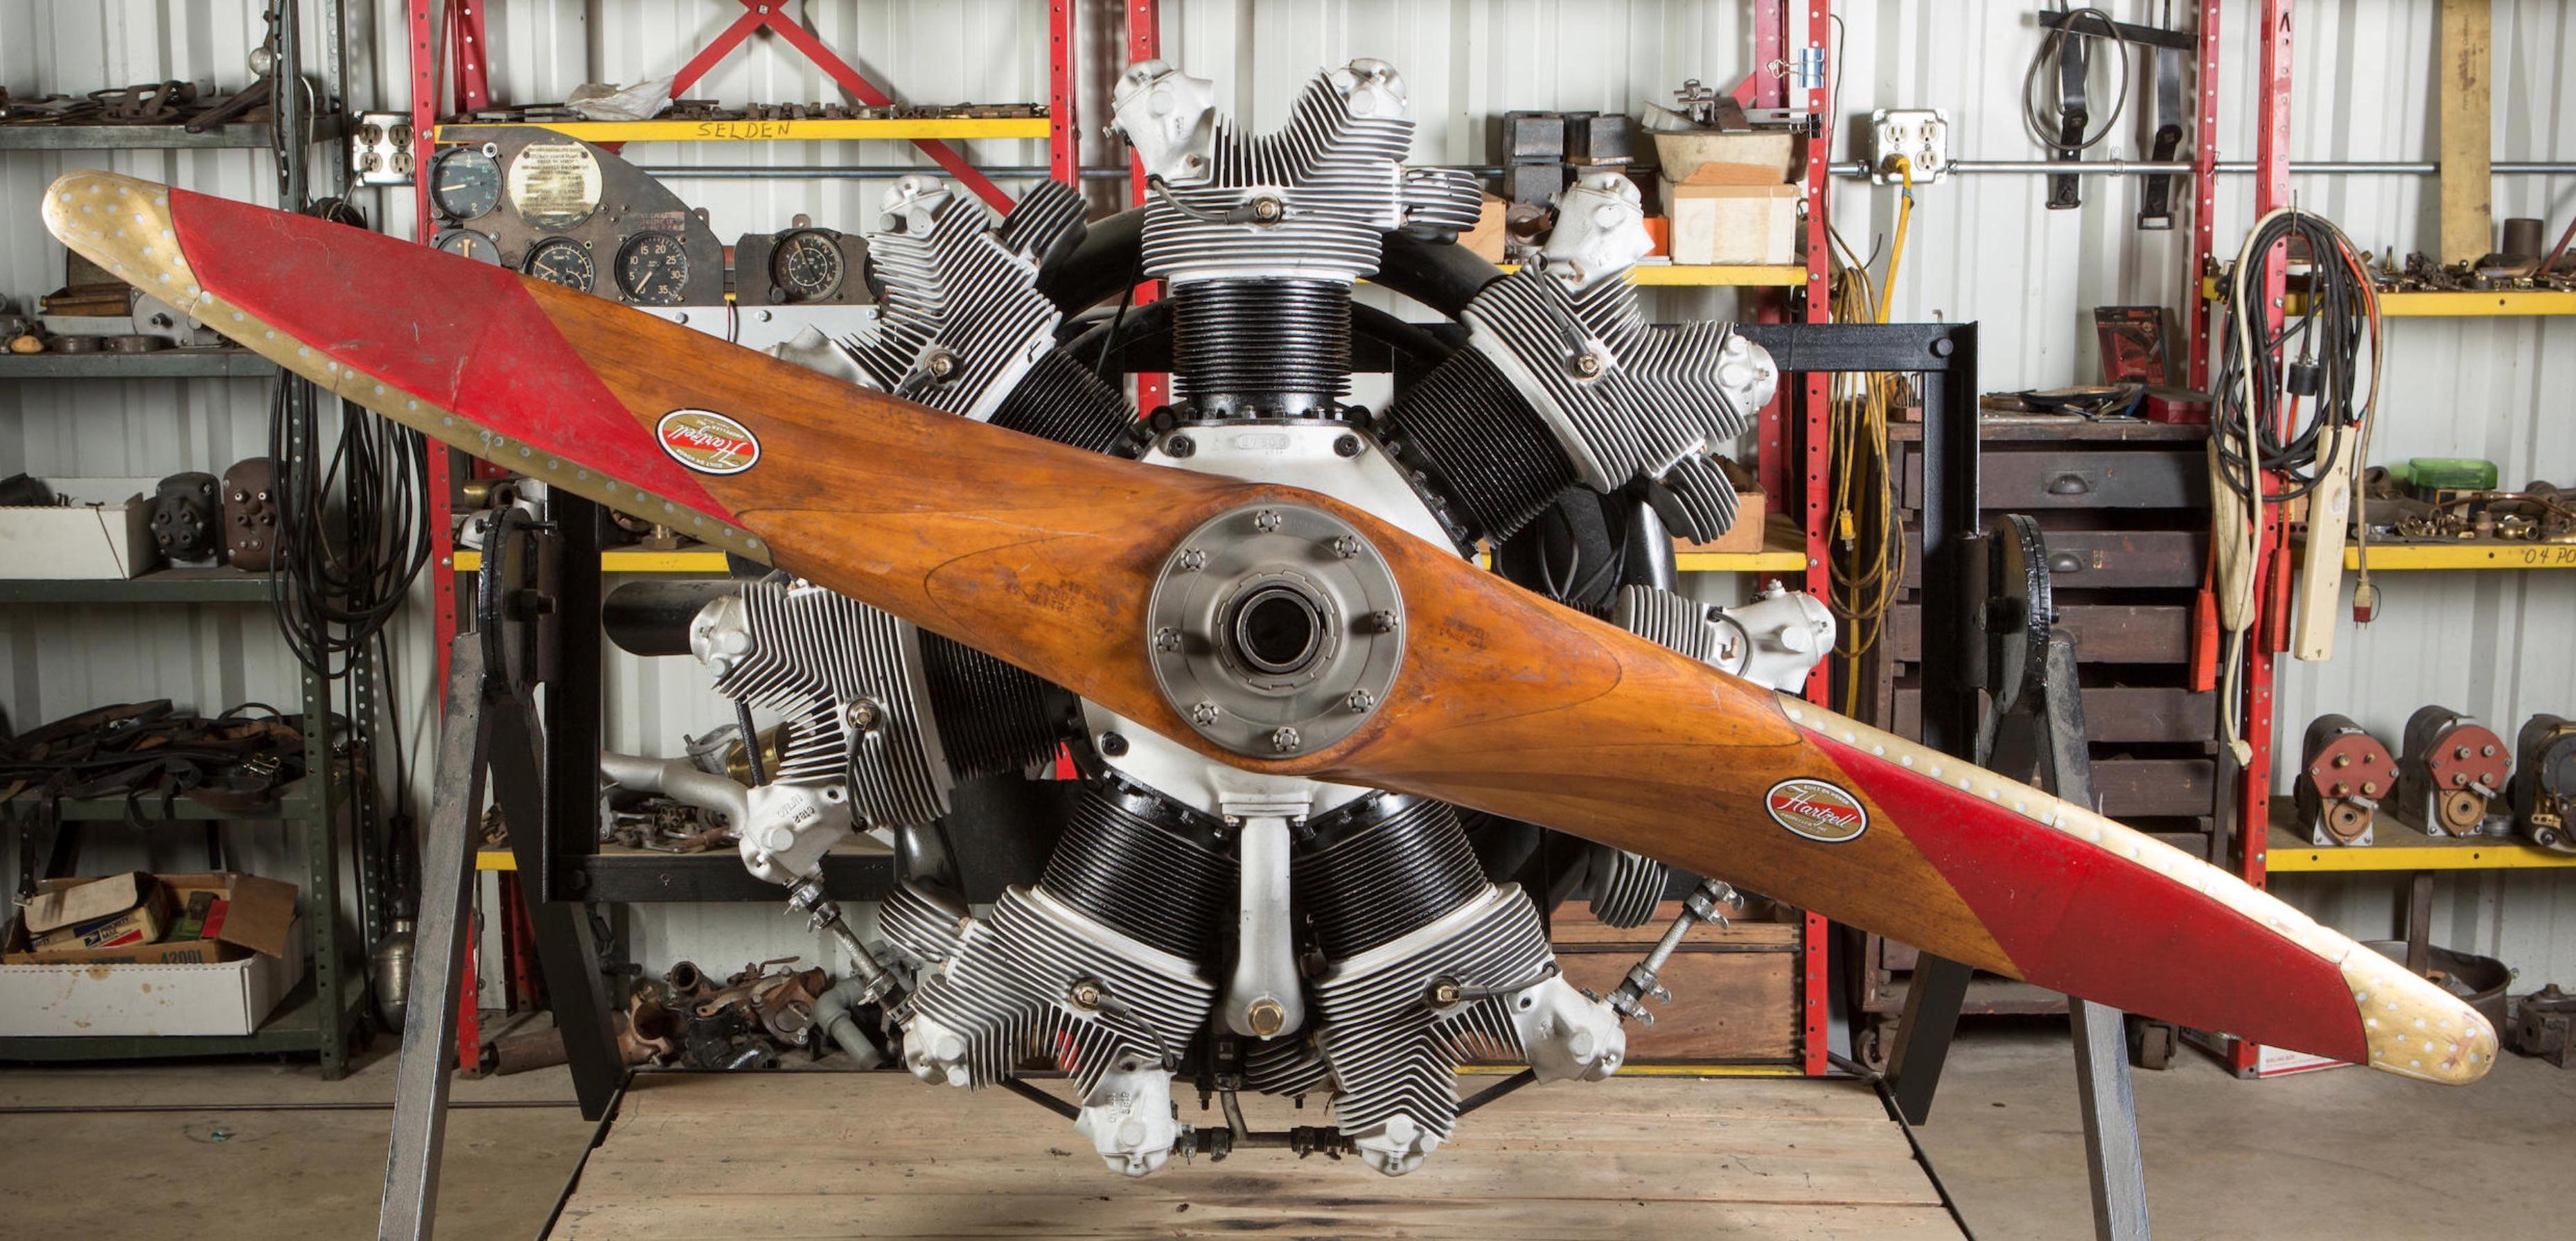 Continental R-670 7-Cylinder Radial Engine